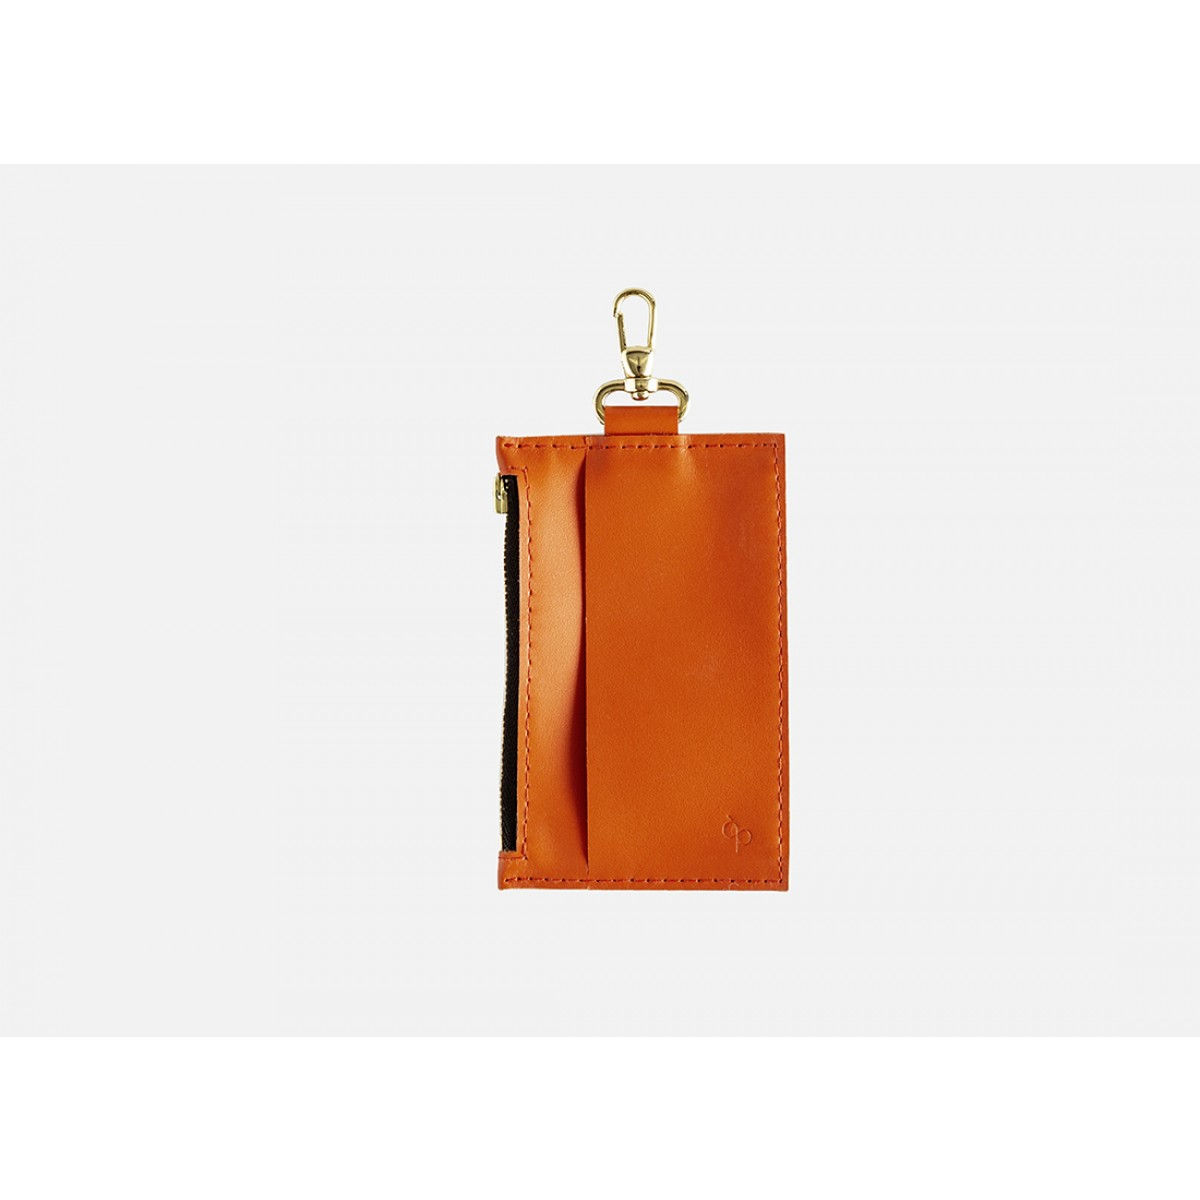 Lapàporter – Mini-Lederportemonnaie mit Karabiner, orange